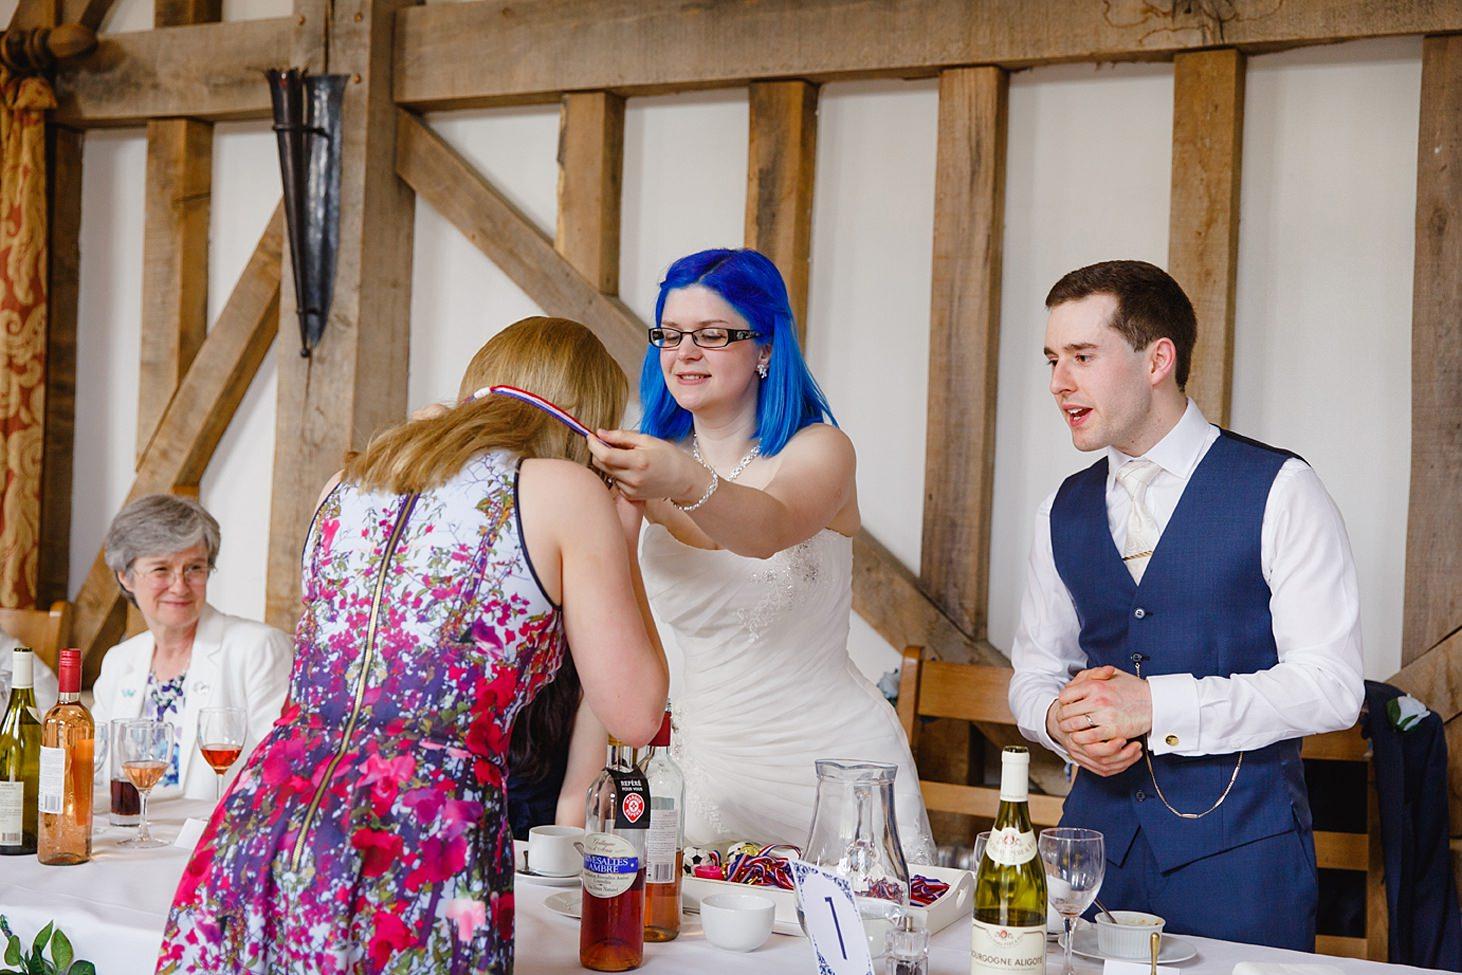 gate street barn wedding photography bride giving medal